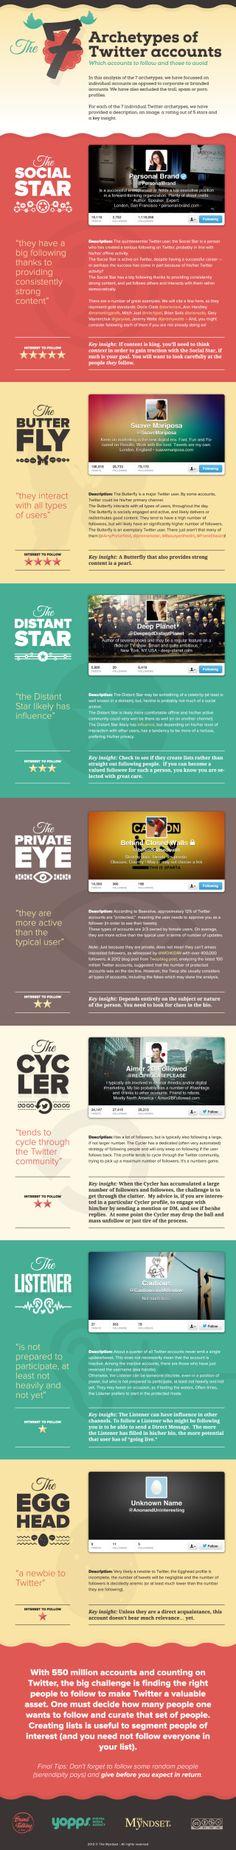 The 7 archetypes of Twitter accounts #infografia #infographic #socialmedia